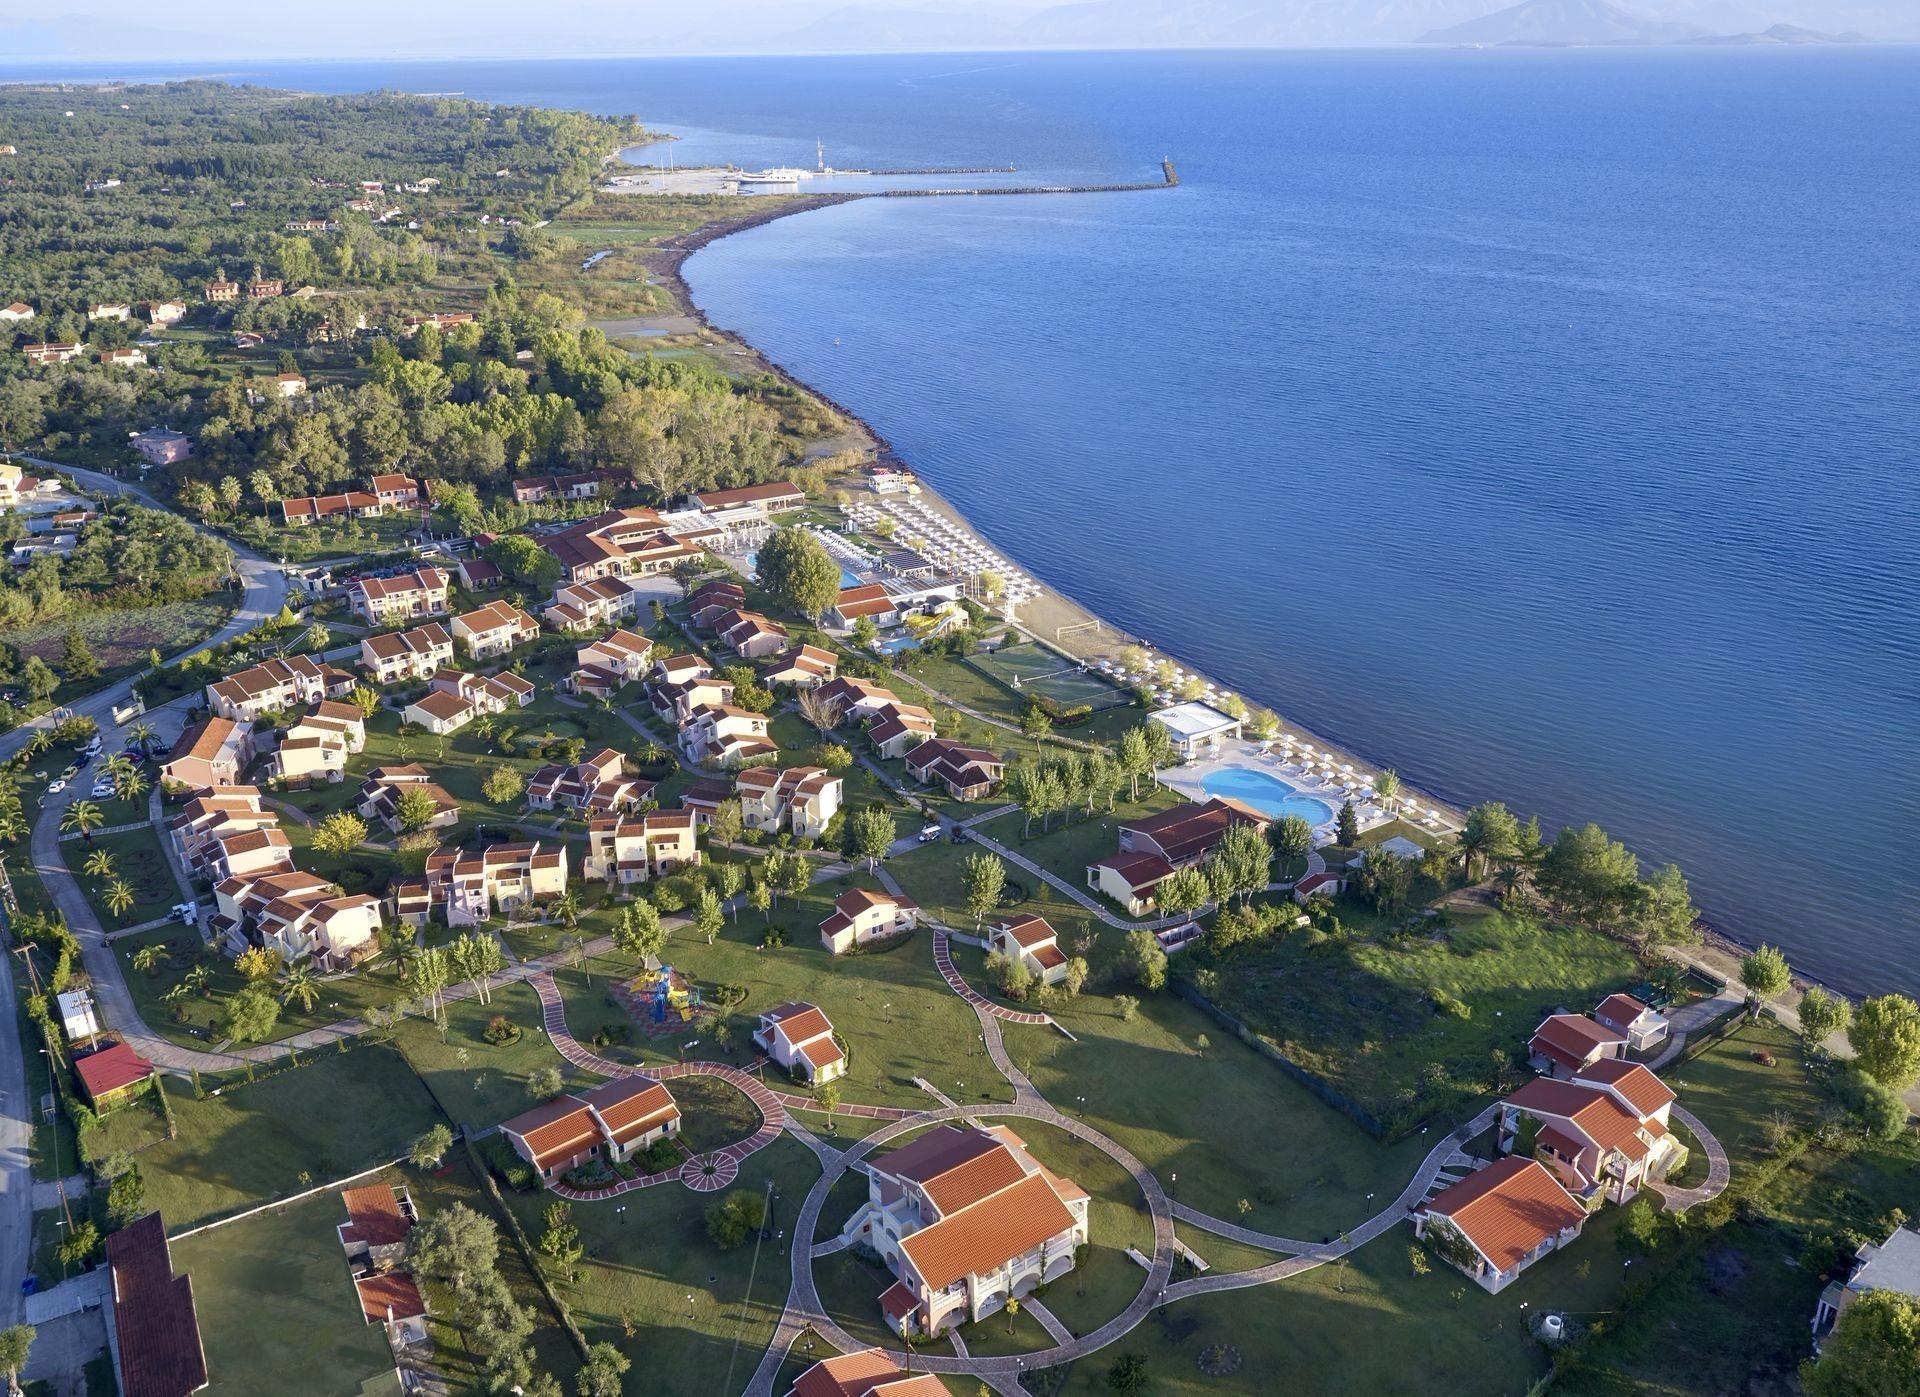 Mayor Capo Di Corfu Family Beach Resort In Corfu Island